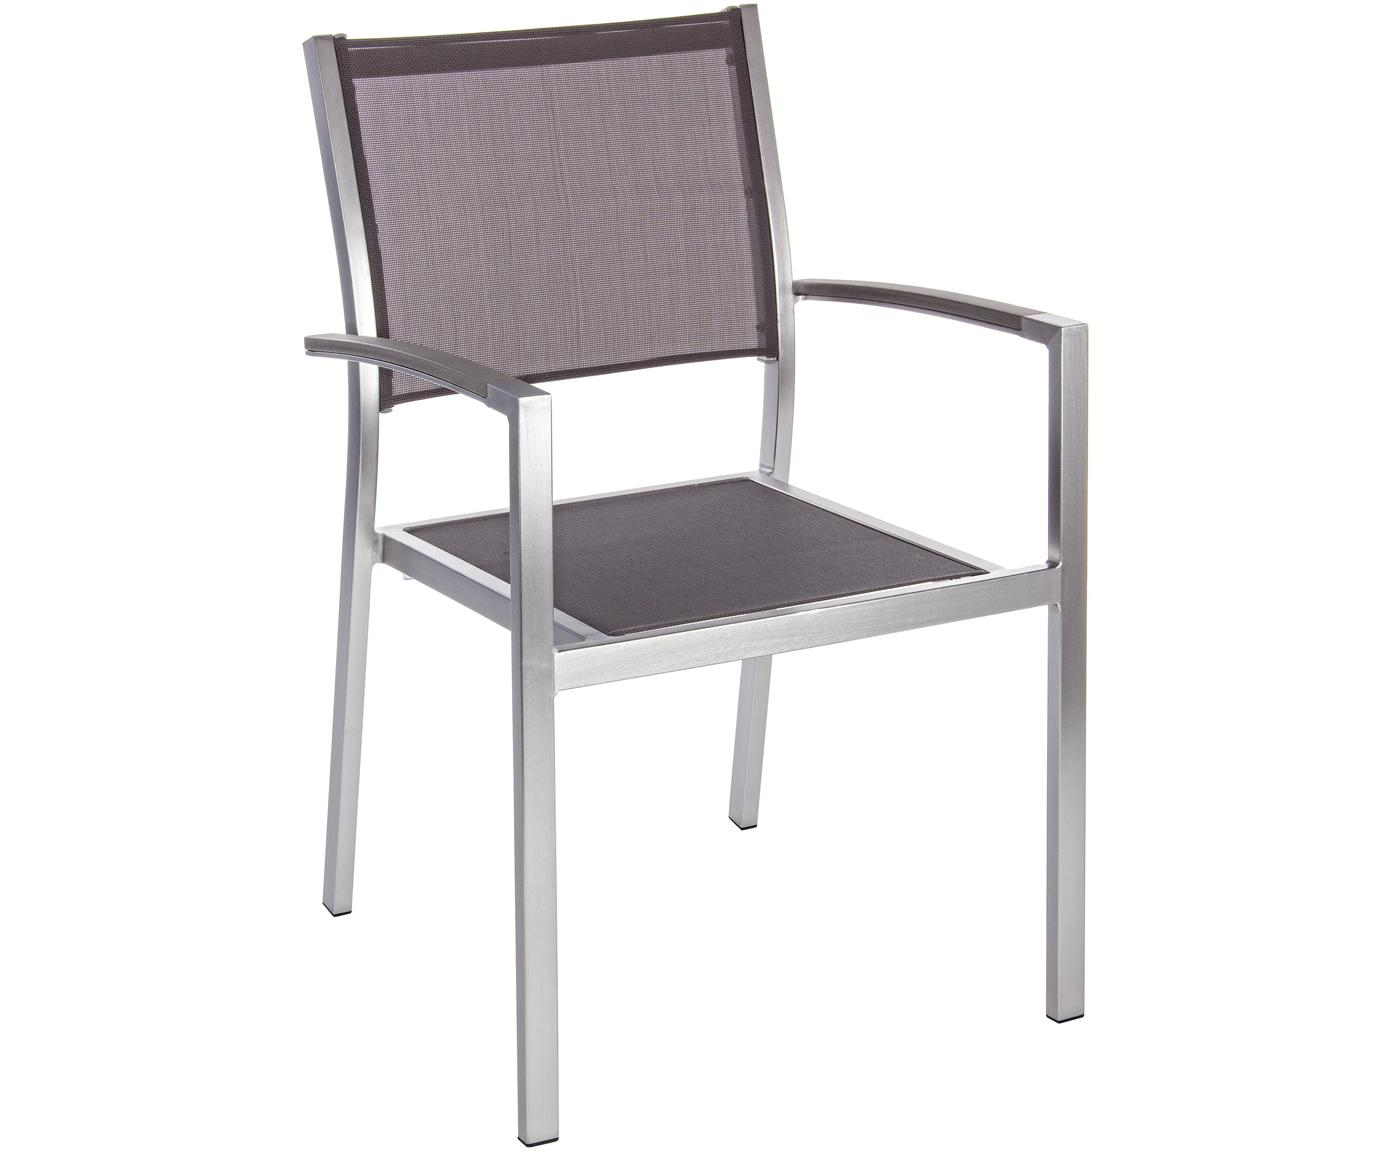 Tuinstoel Irwin, Frame: gesatineerd aluminium, Zitvlak: Textilene, Staal, grijs, B 54 x D 57 cm